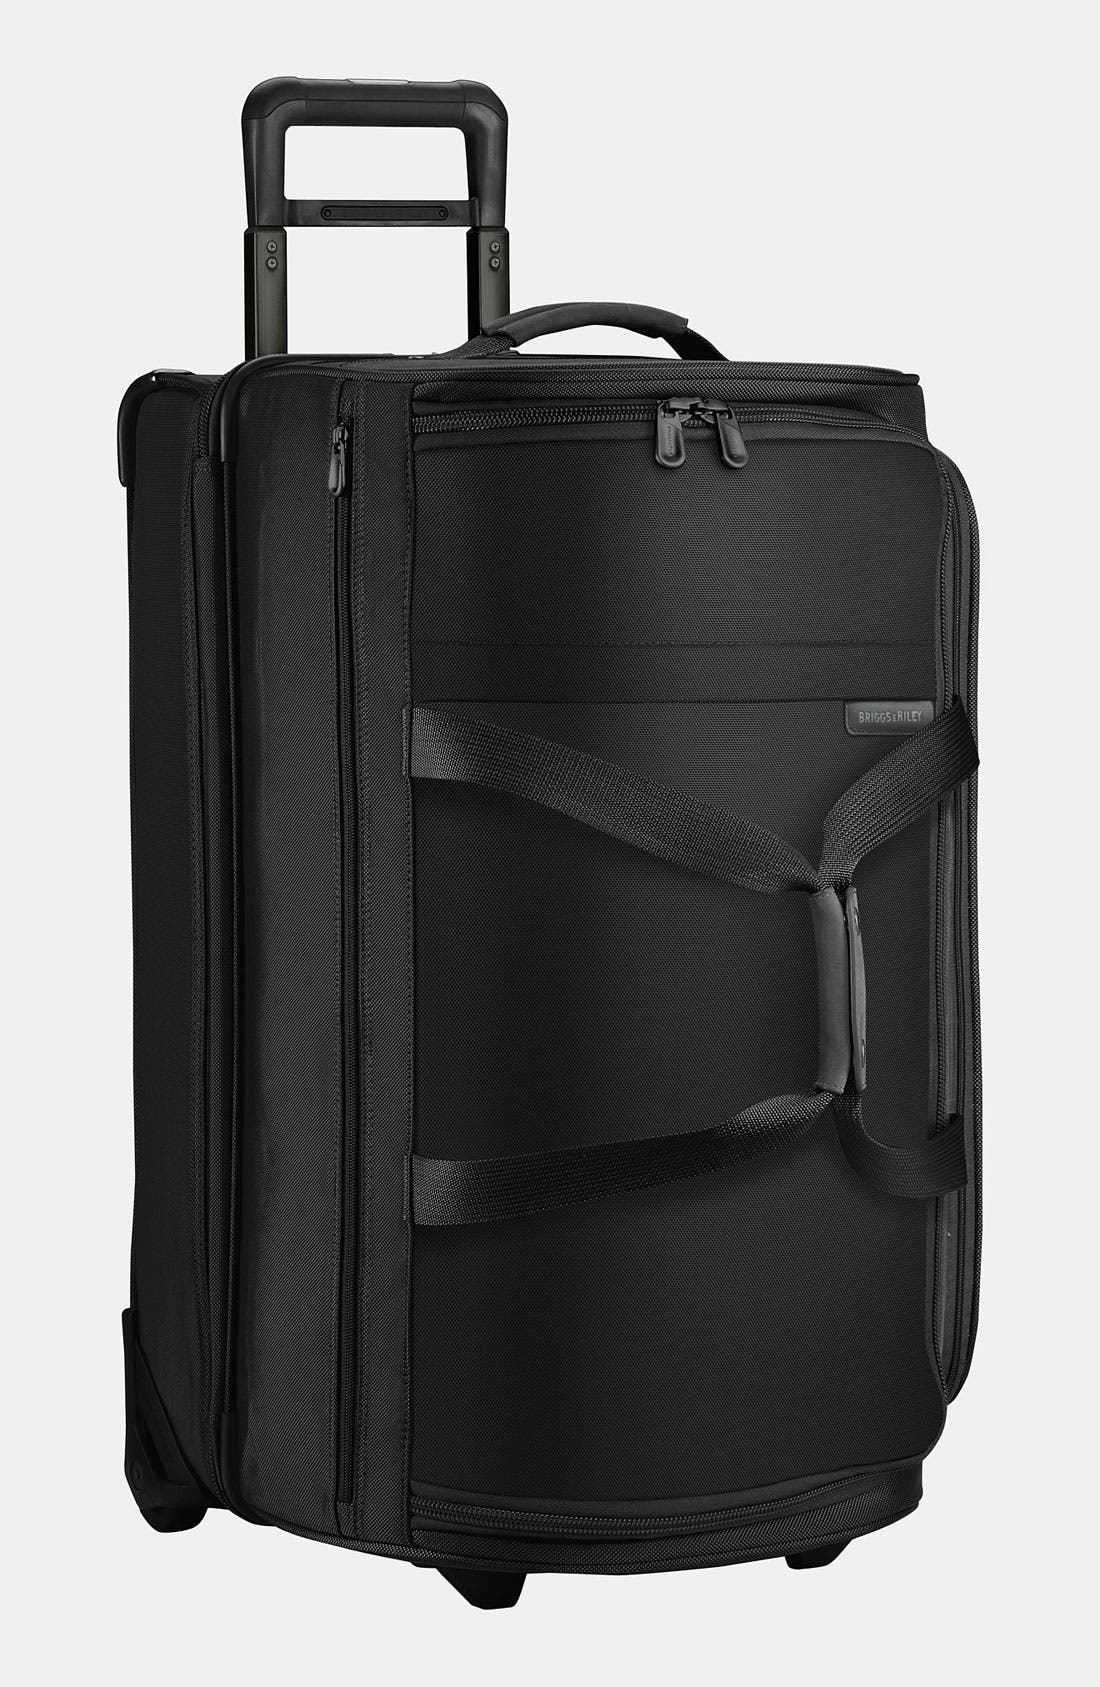 Main Image - Briggs & Riley 'Medium Baseline' Rolling Duffel Bag (27 Inch)